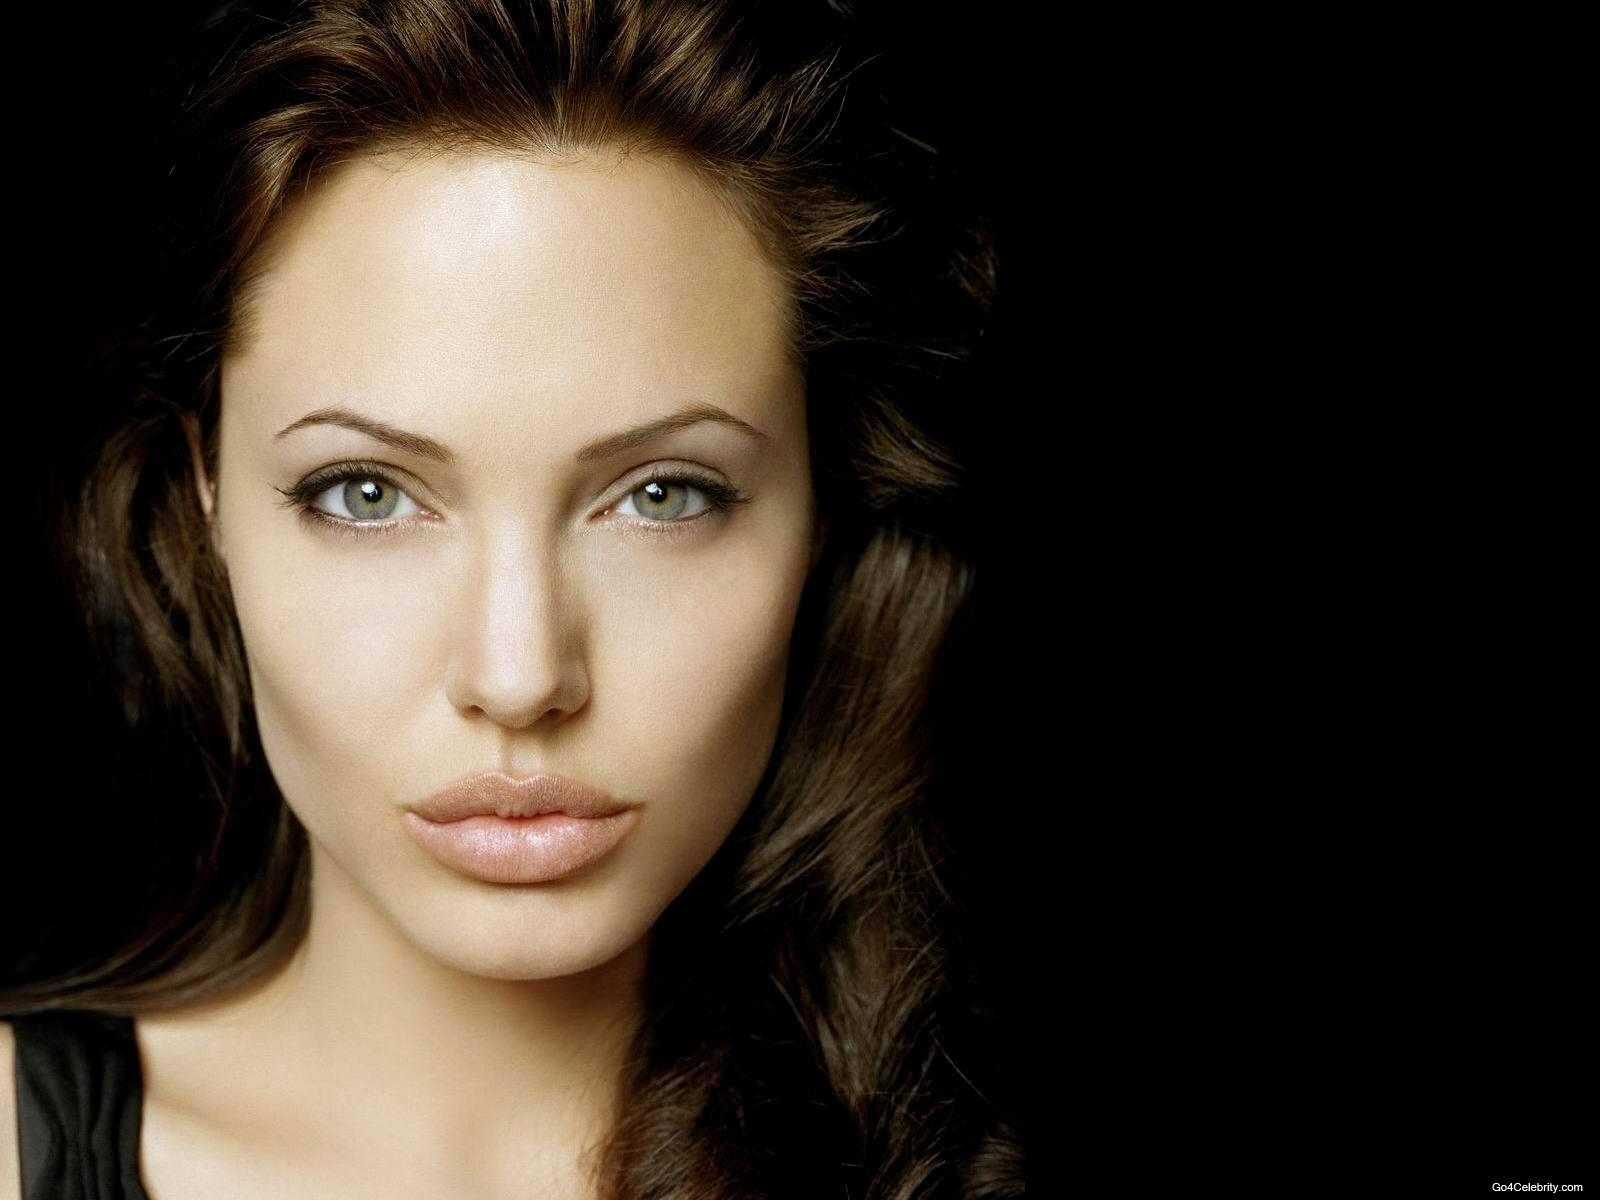 http://3.bp.blogspot.com/-oicLNT5W3EI/TfMZBLx7VbI/AAAAAAAACM0/s5N7xqHCvNs/s1600/Angelina-Jolie-07.jpg